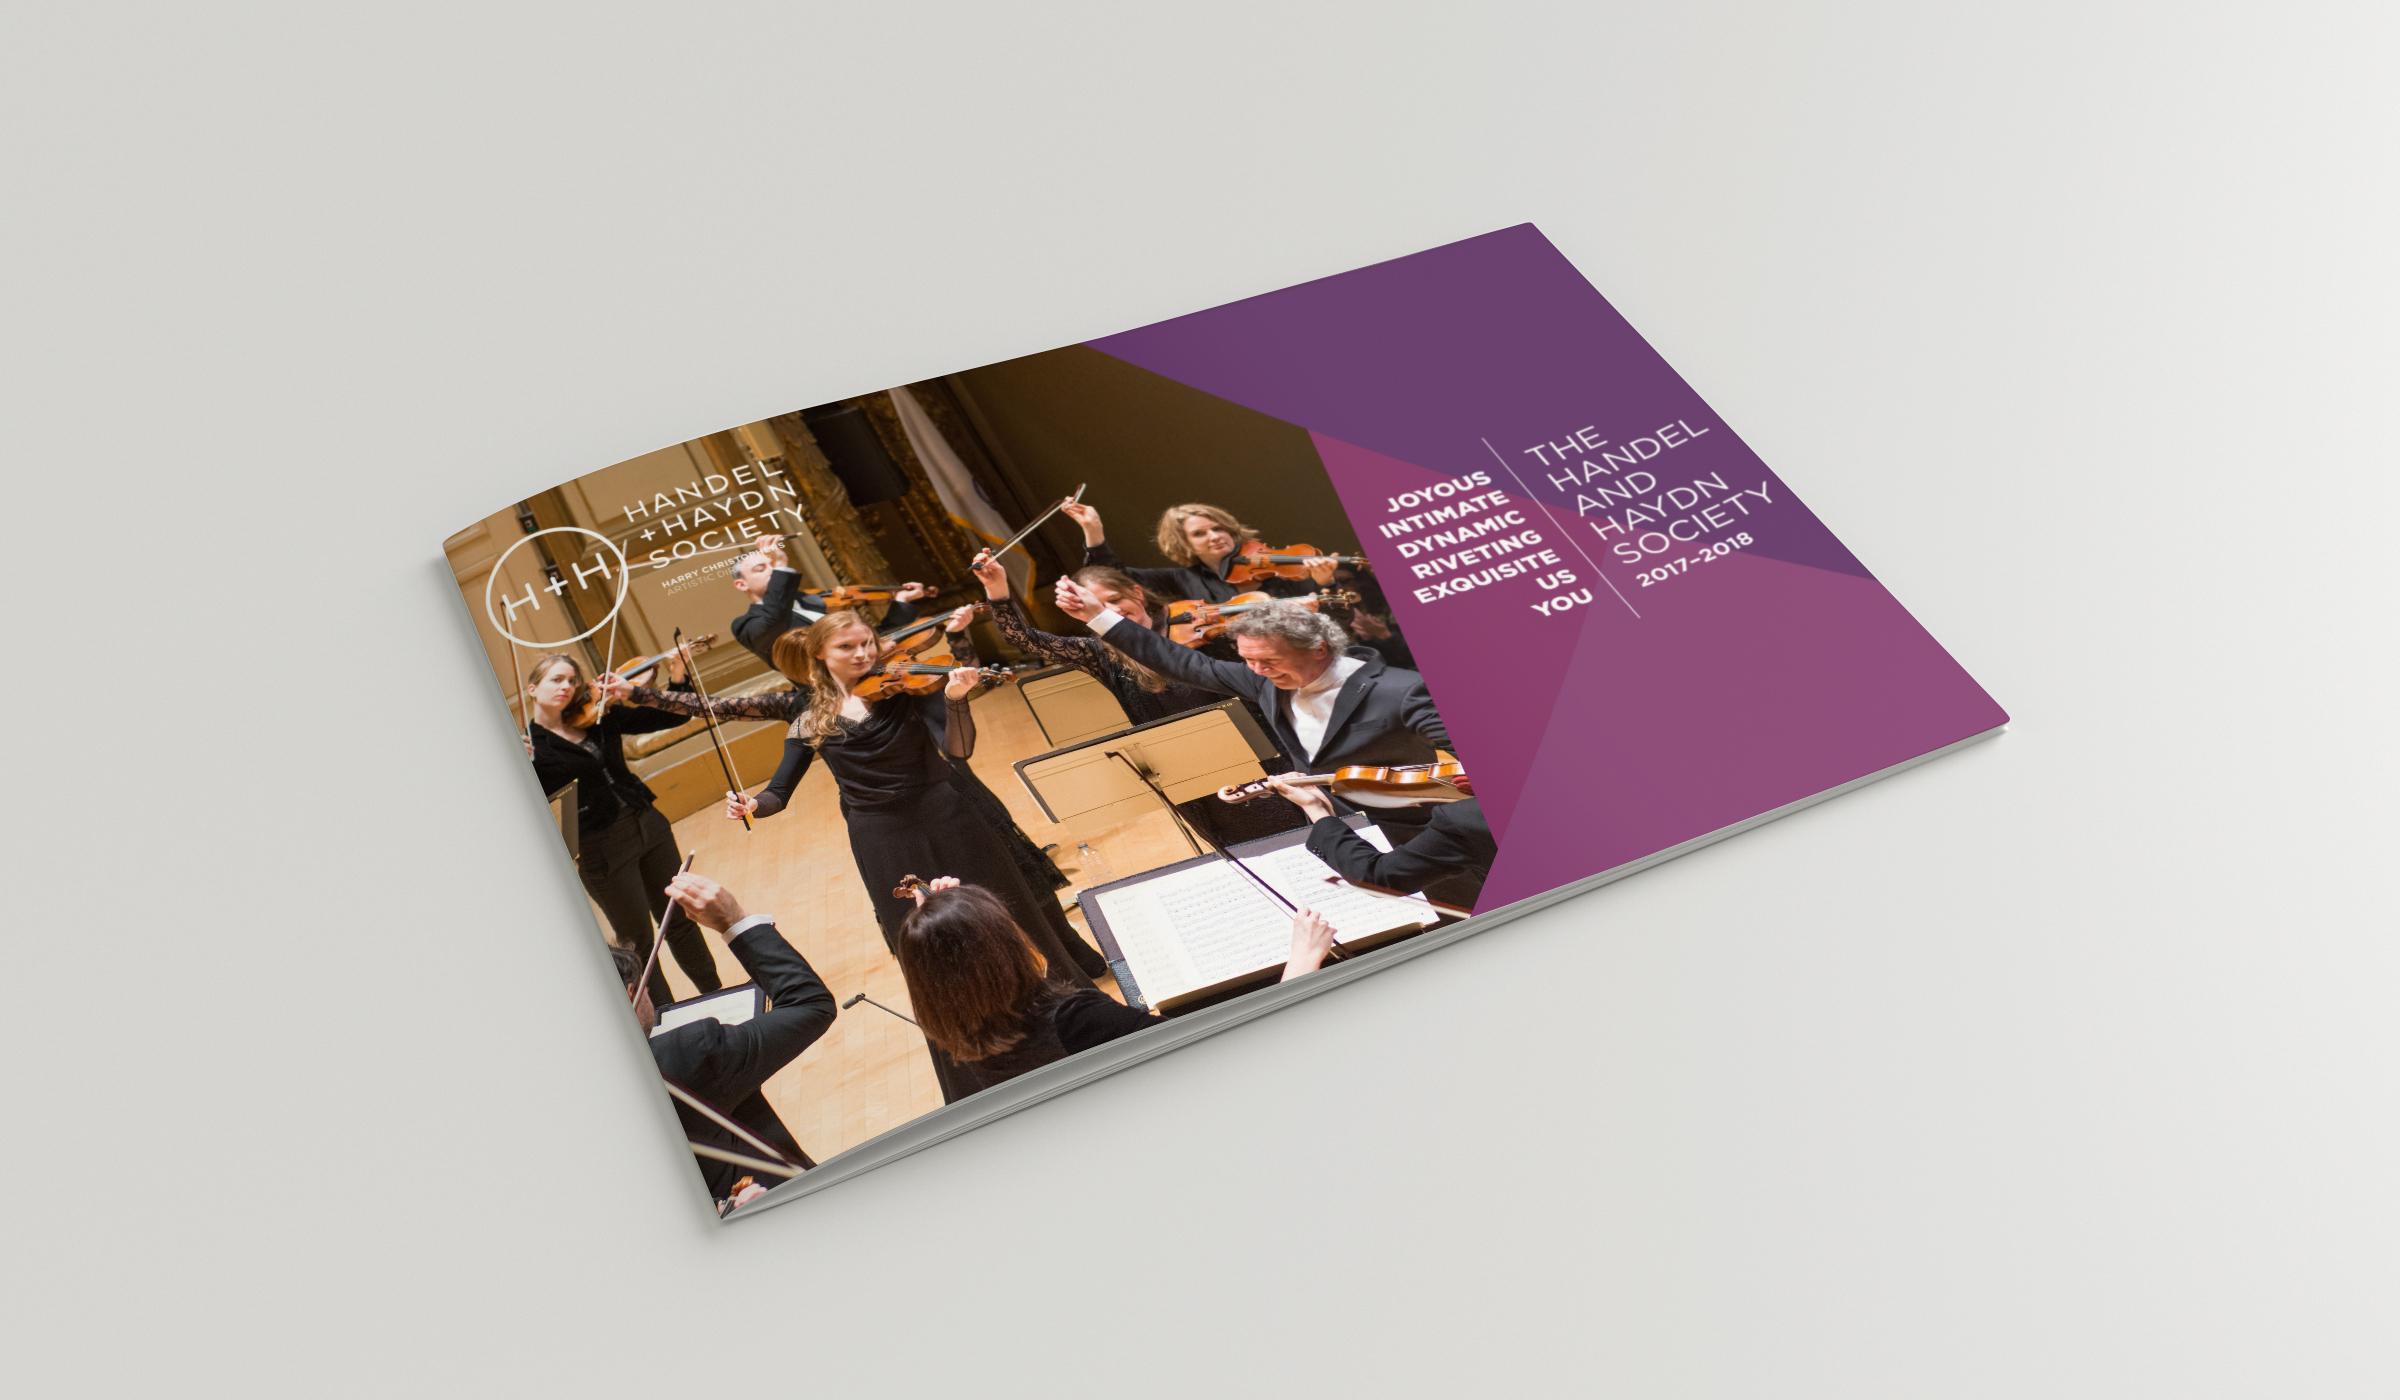 Handel and Haydn Society Brochure Mockup 1_WEB.jpg